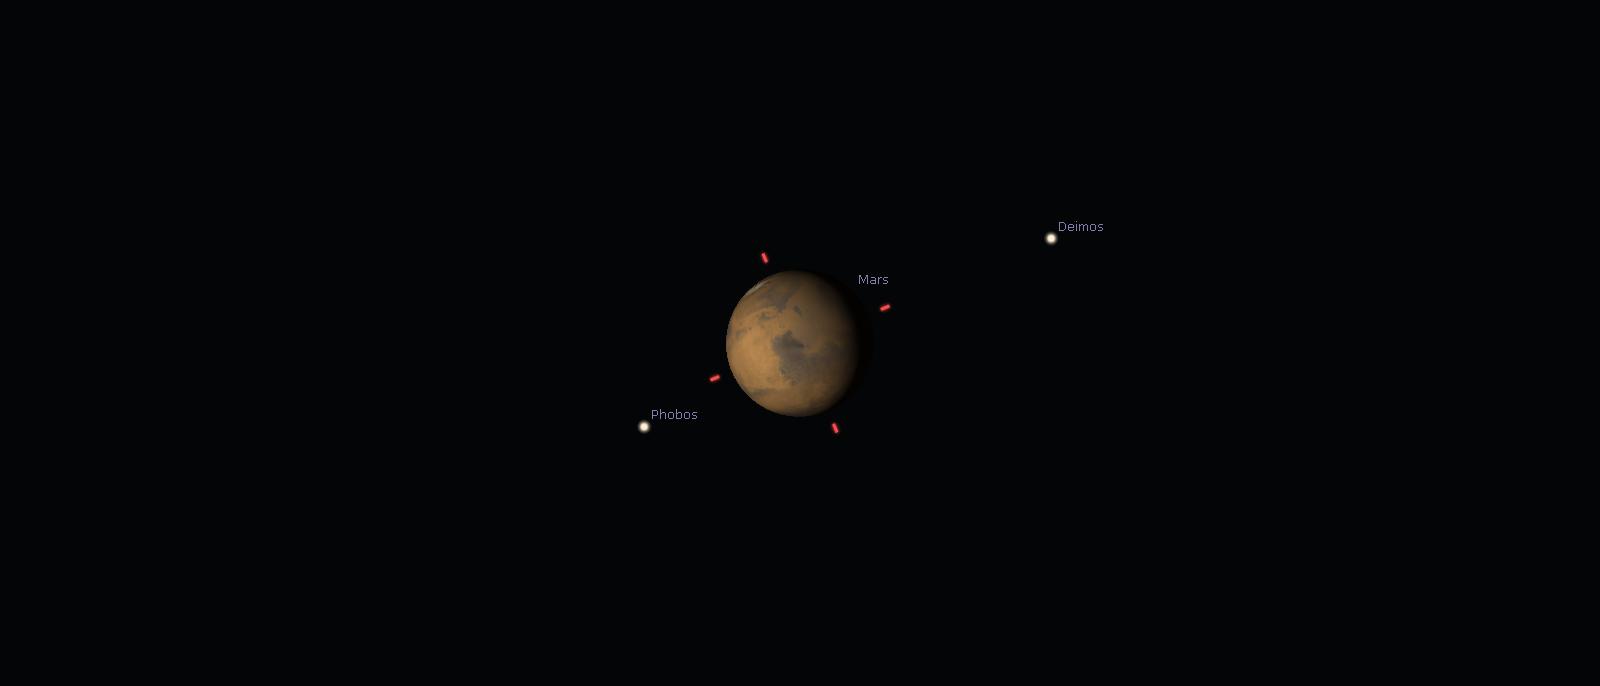 Mars am 1. März 2016